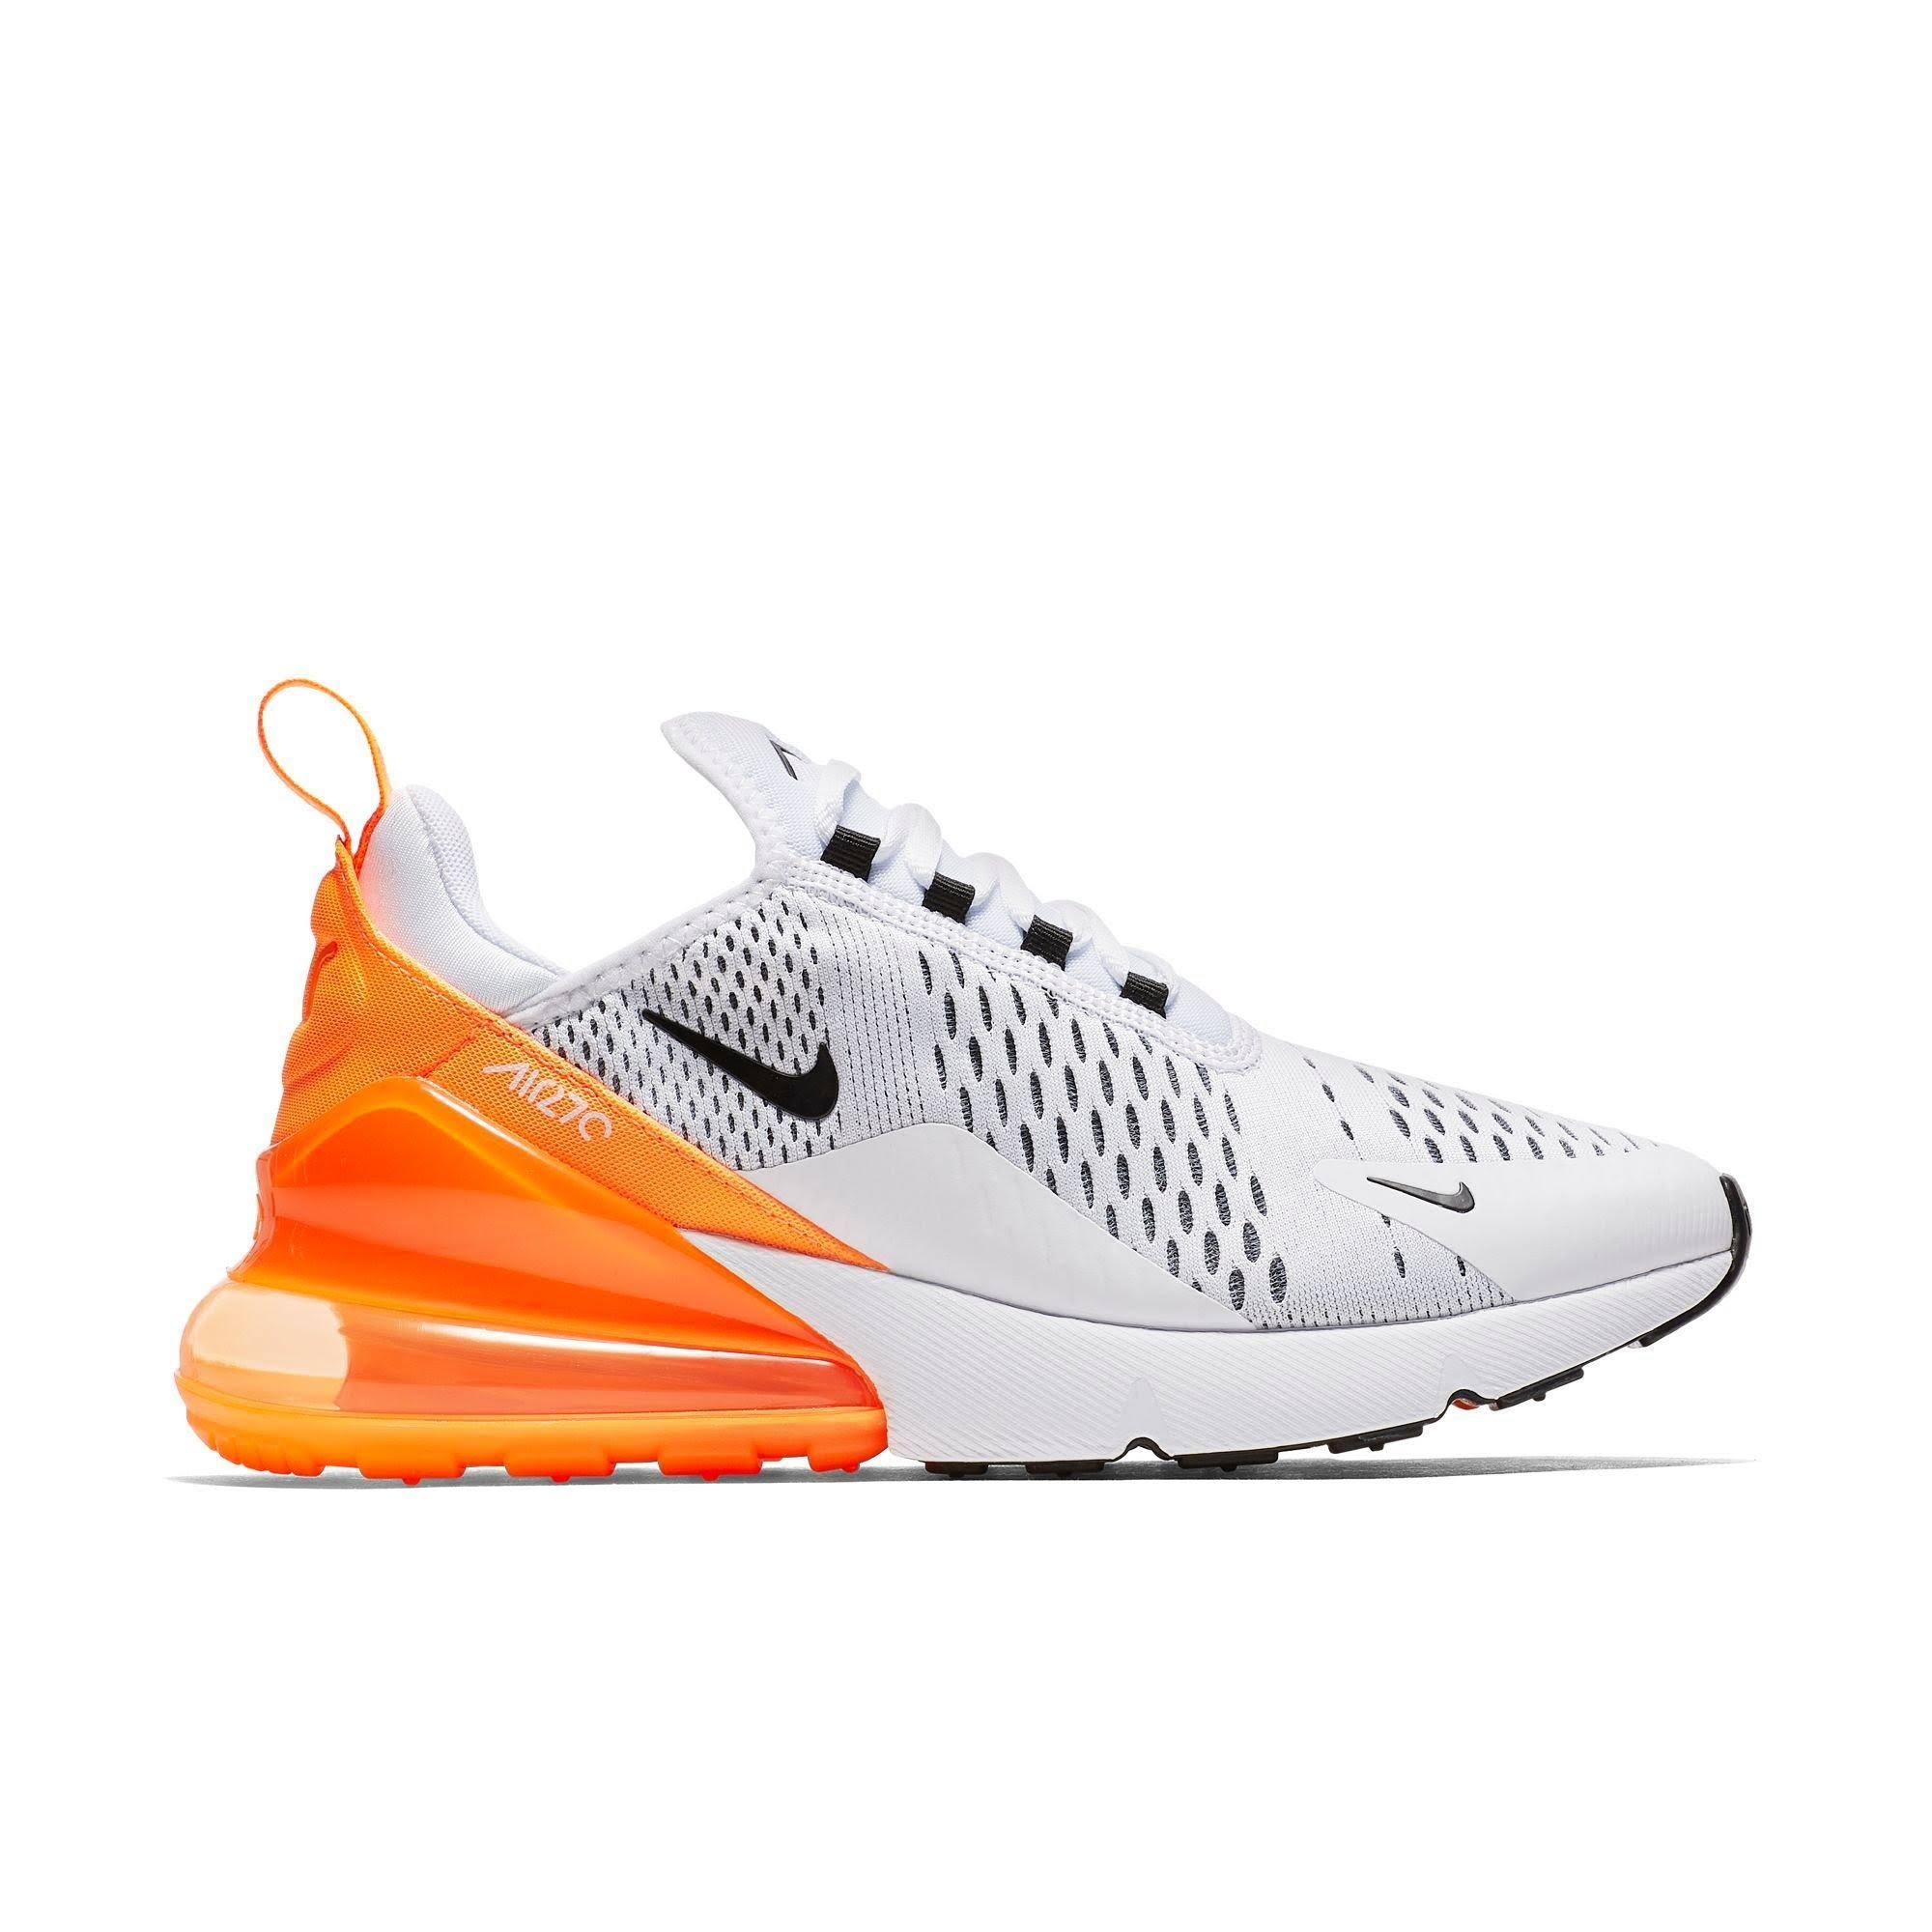 270 Tamaño De Zapatos Air Nike Ah6789104 Max Mujer 10 ZSqEIH0w